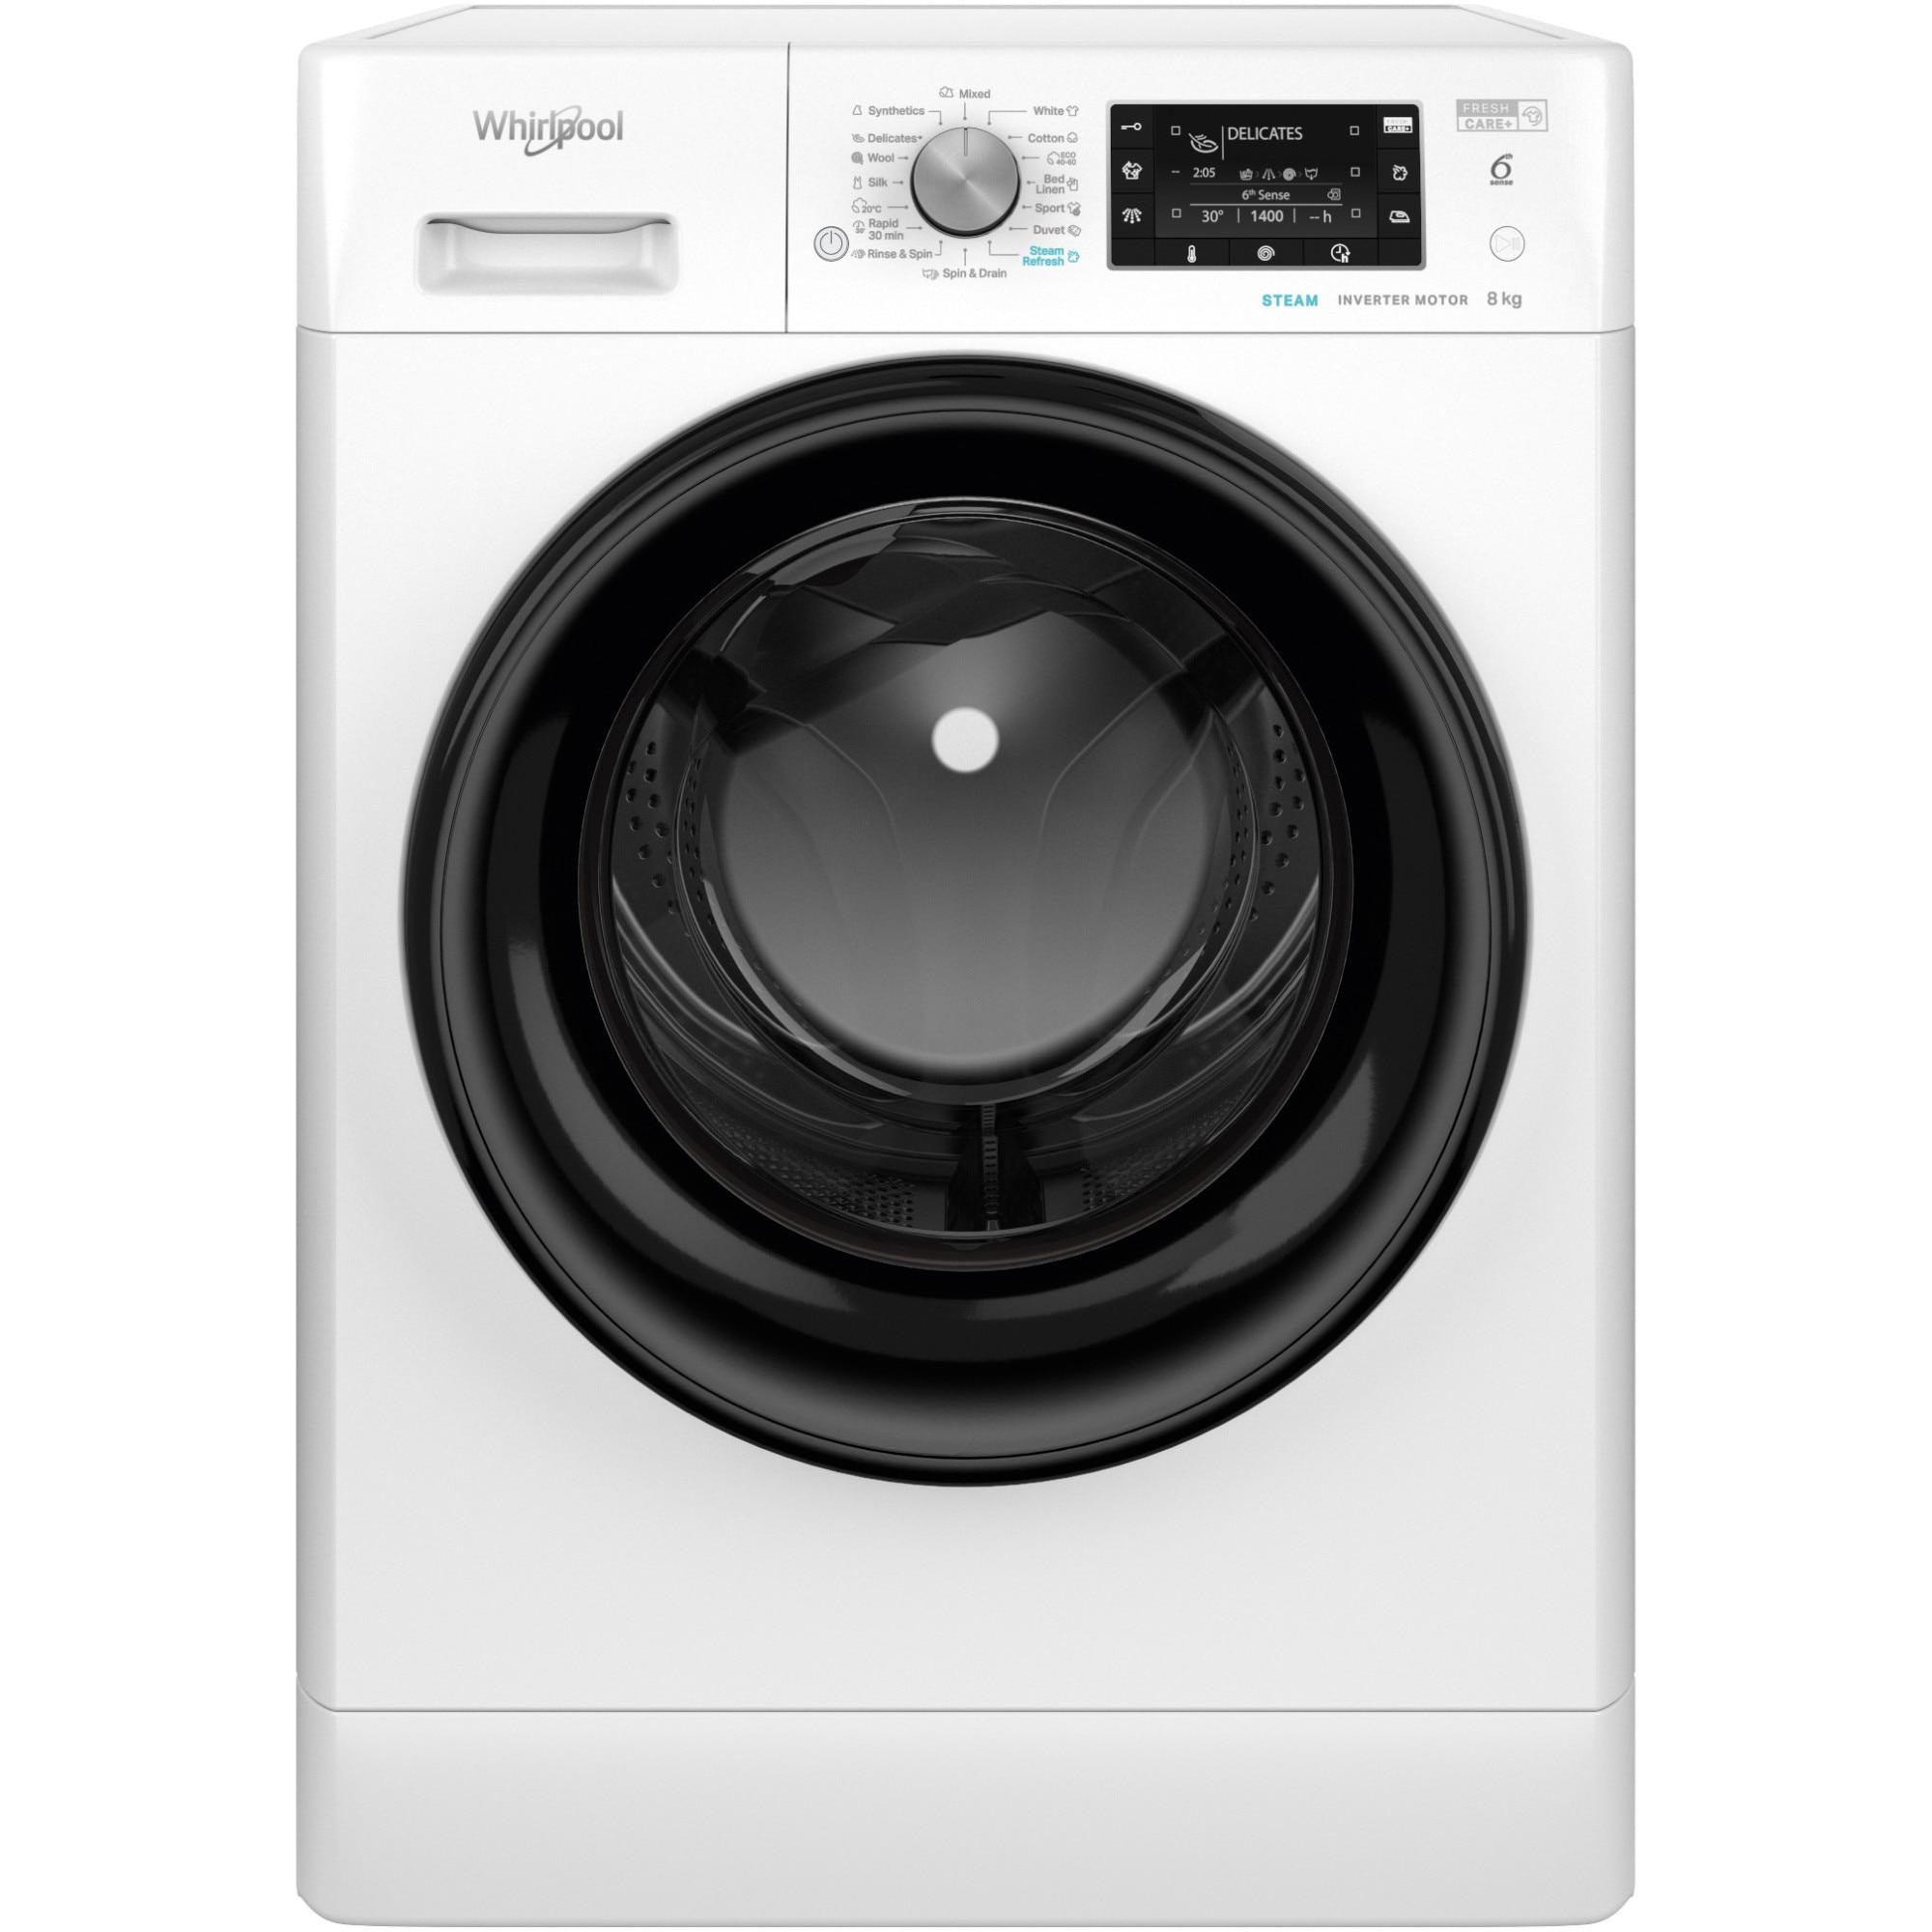 Fotografie Masina de spalat rufe Whirlpool FFD8638BVEE, 8kg, 1600 RPM, Clasa A+++, Tehnologia al-6lea Simt, Motor Inverter, FreshCare, Steam Refresh, Steam Hygiene, Display LCD, Alb